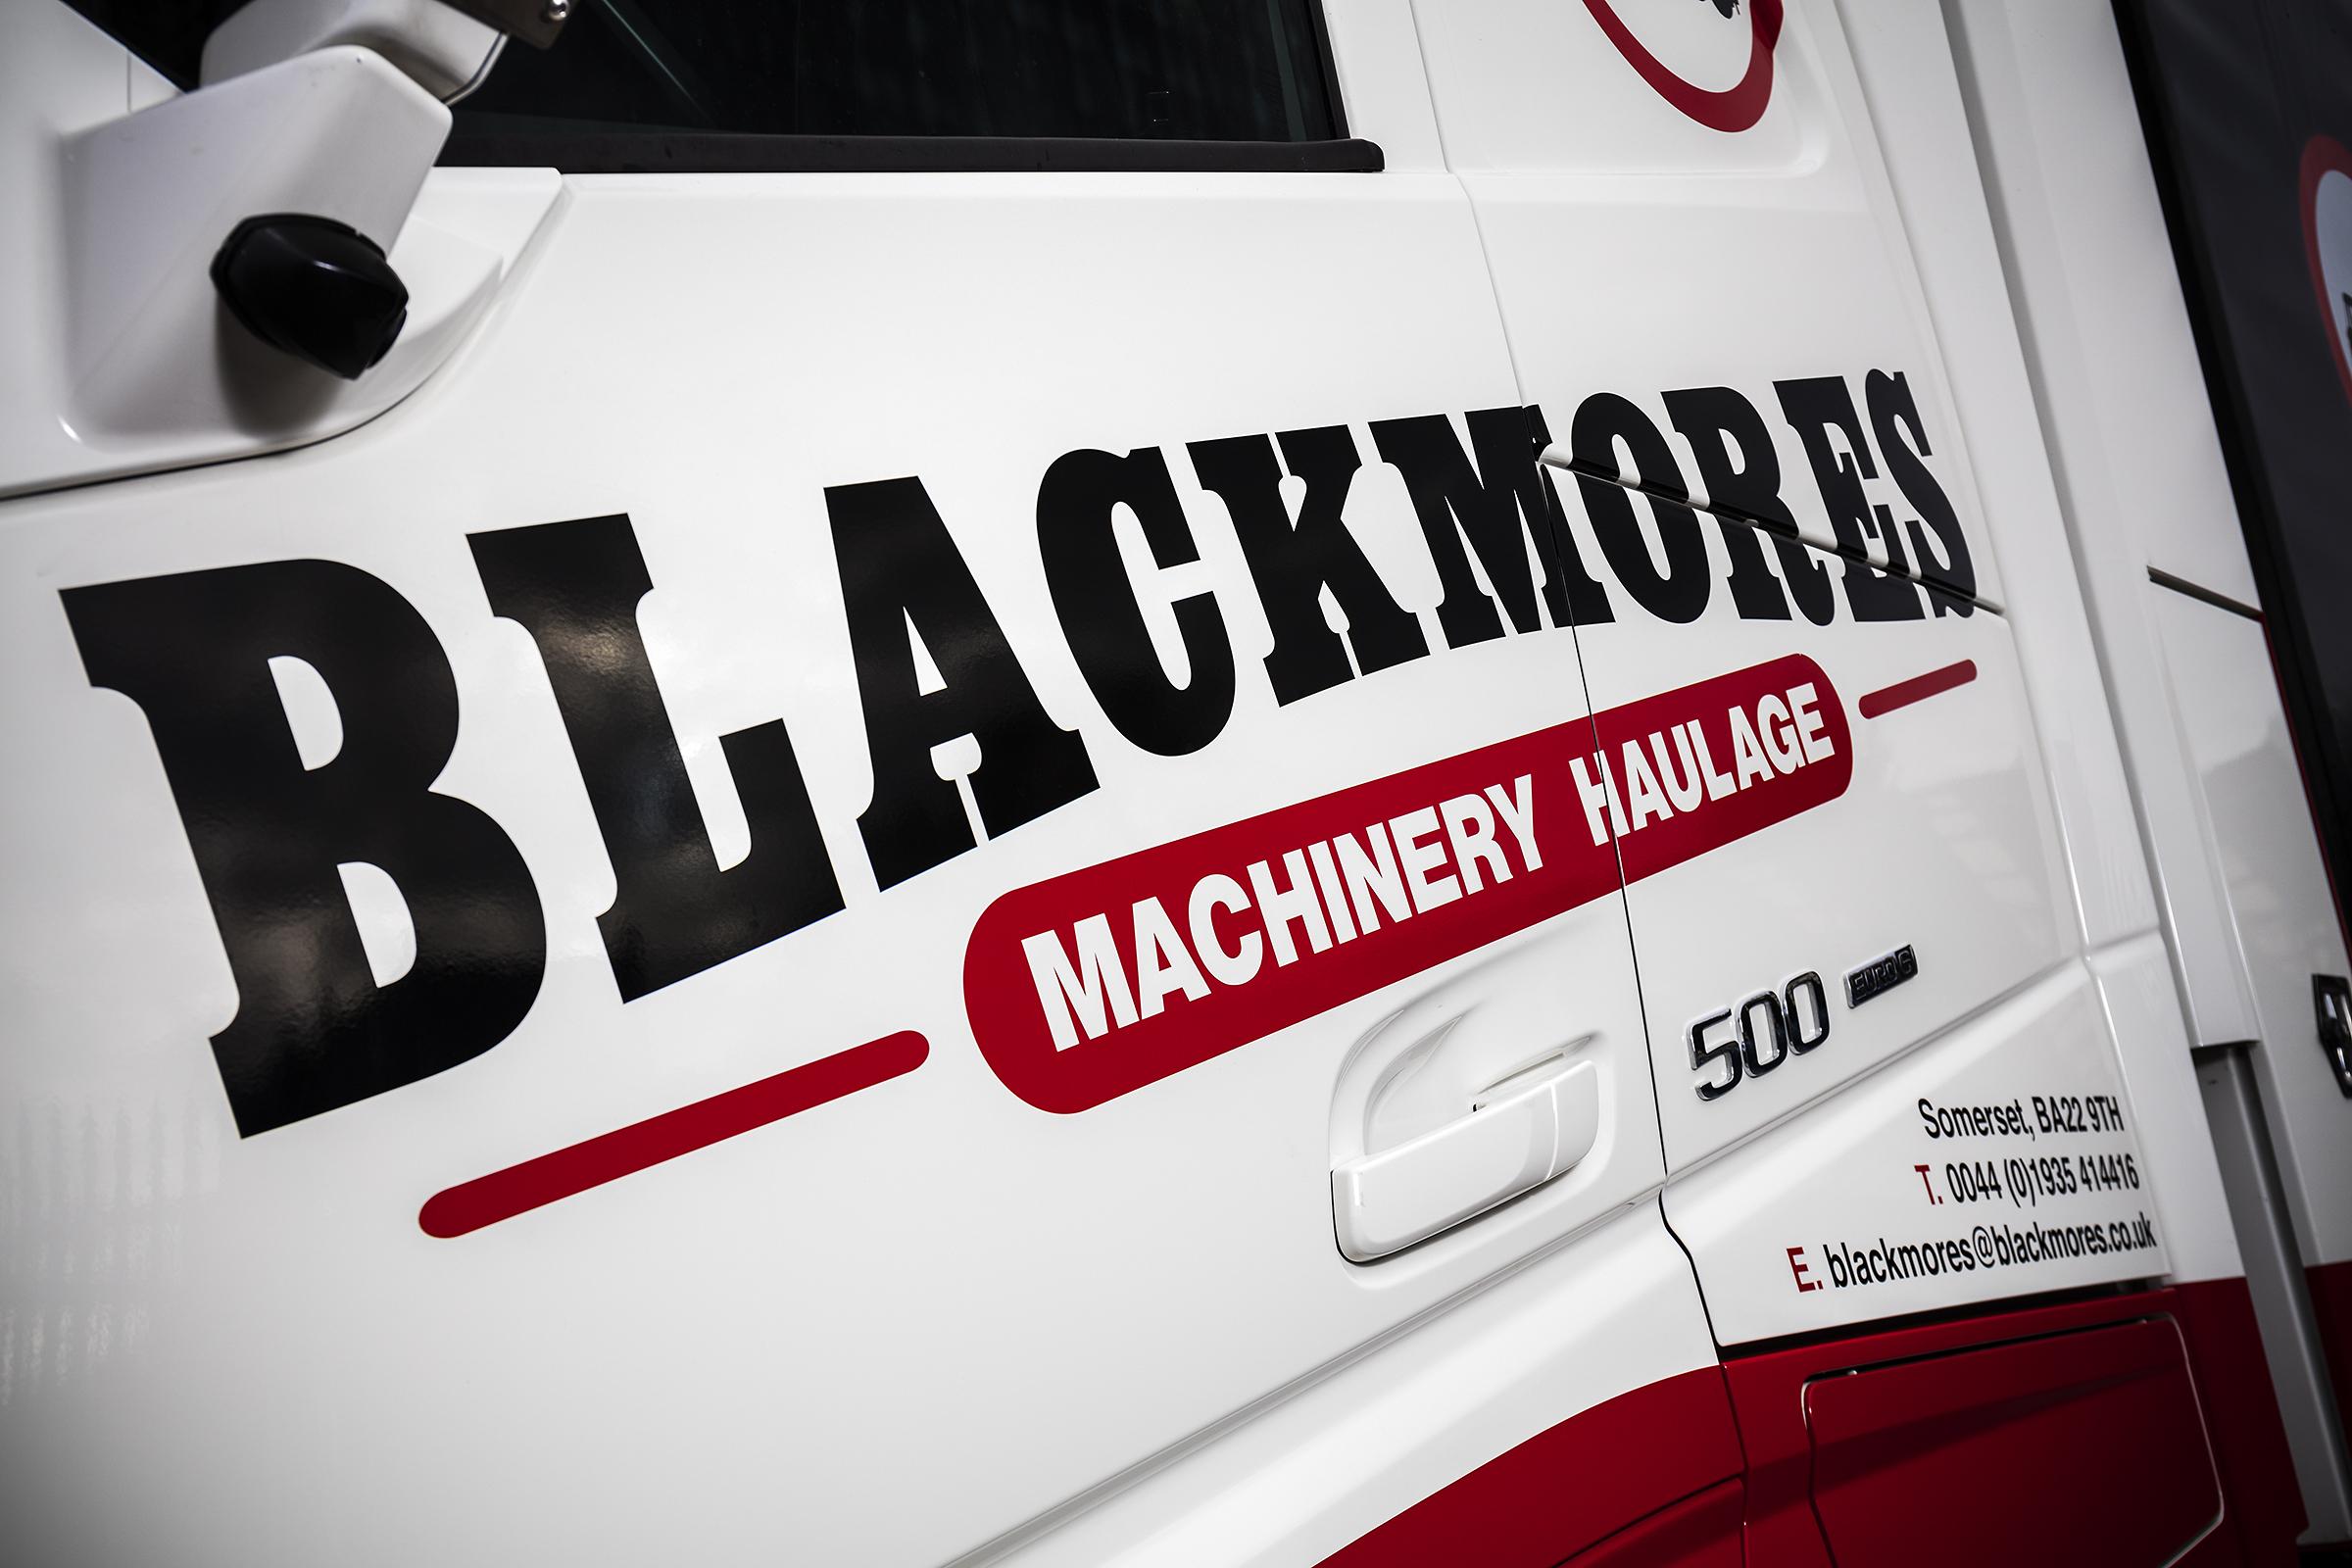 Blackmores Machinery Haulage Ltd